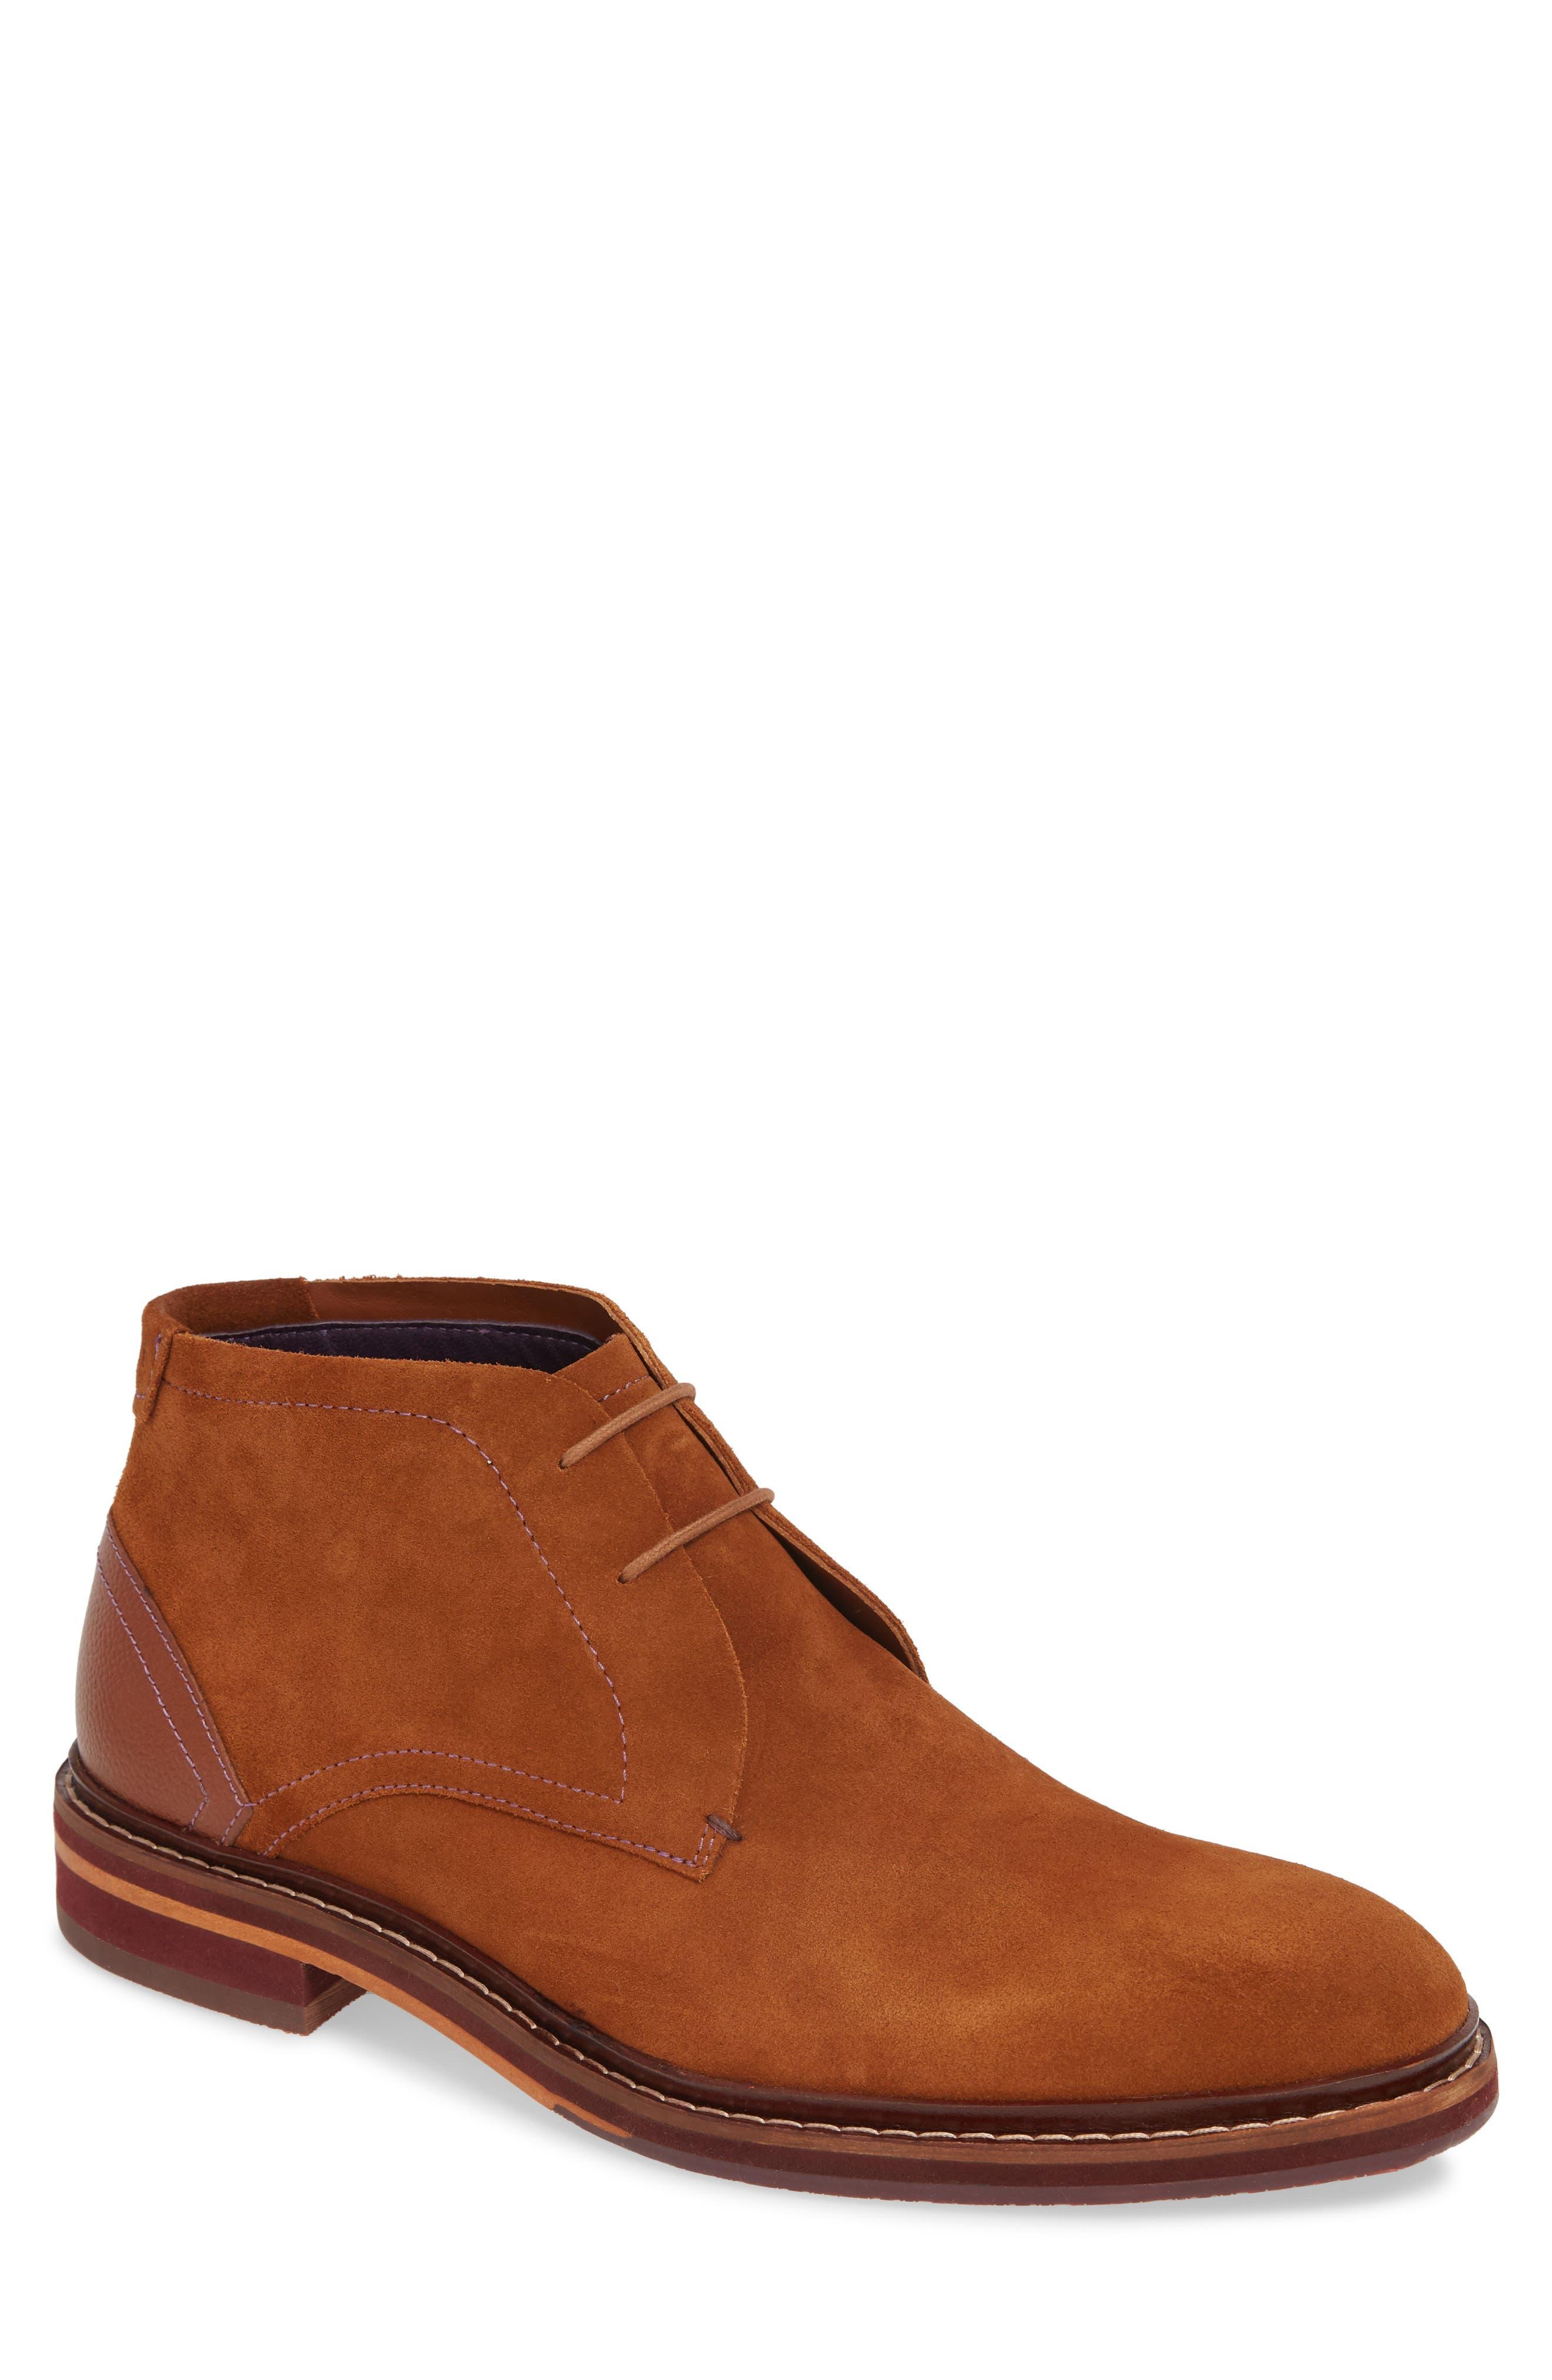 Ted Baker London Deligh Chukka Boot, Brown